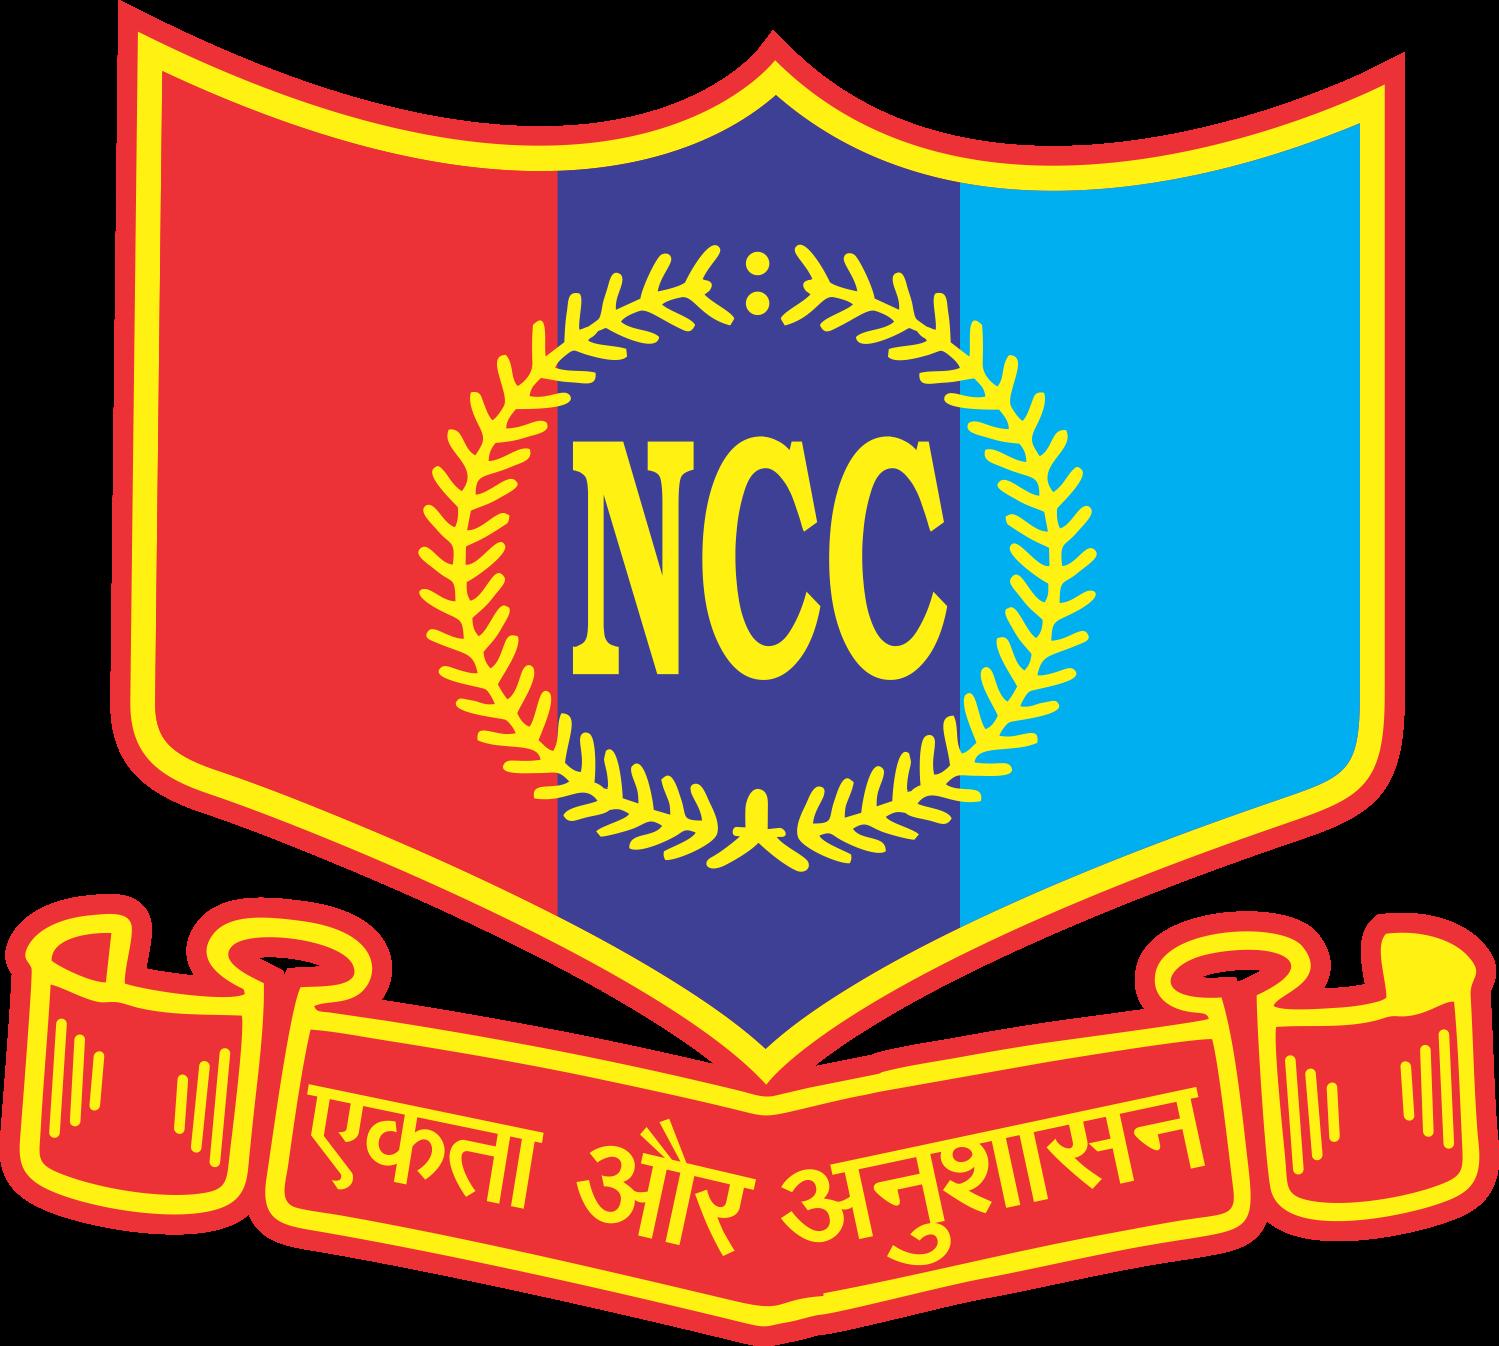 HCPG College, Varanasi